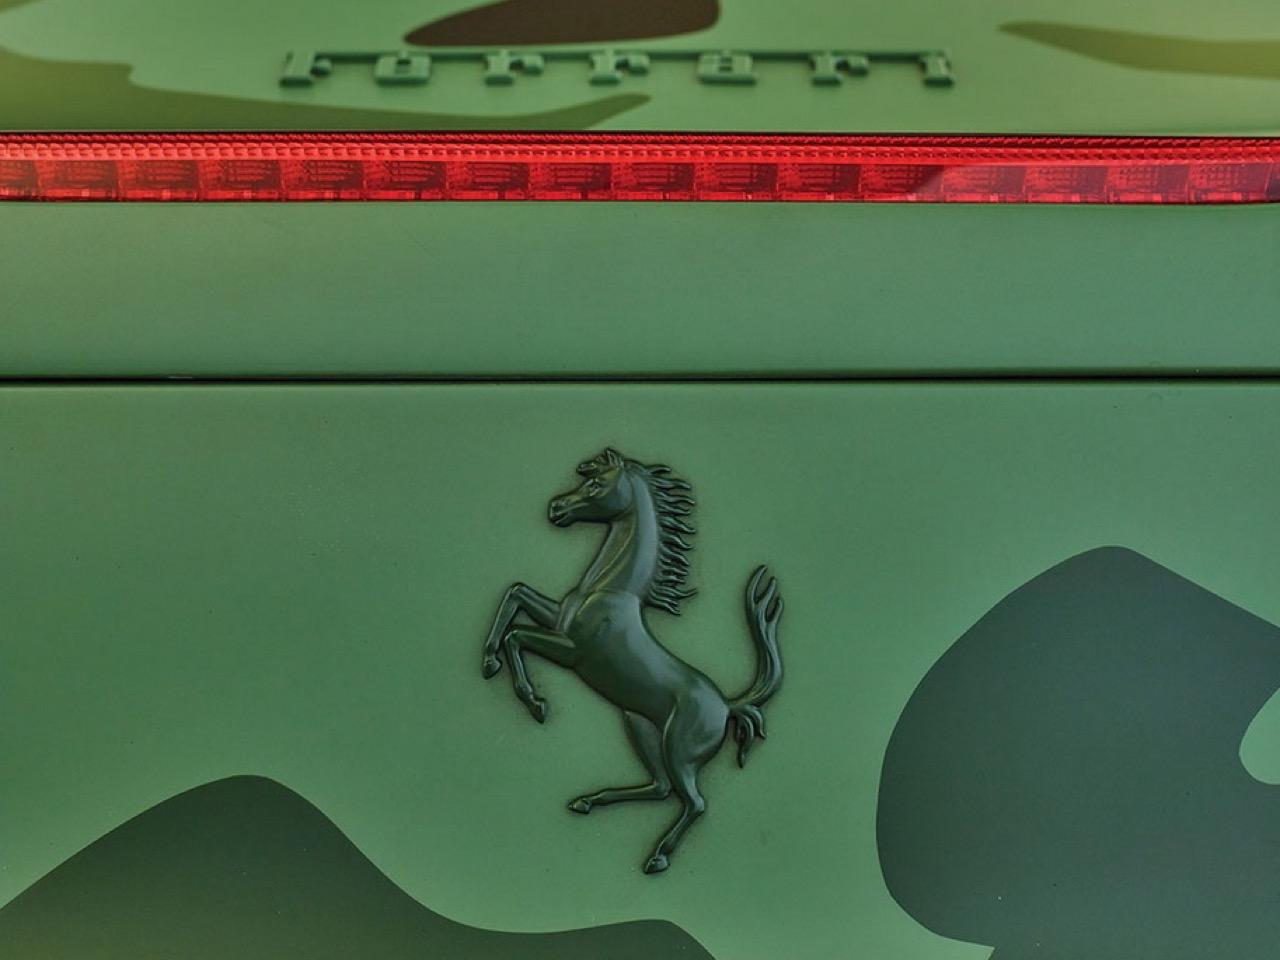 Ferrari 458 Italia Lapo Elkann in auction (9)